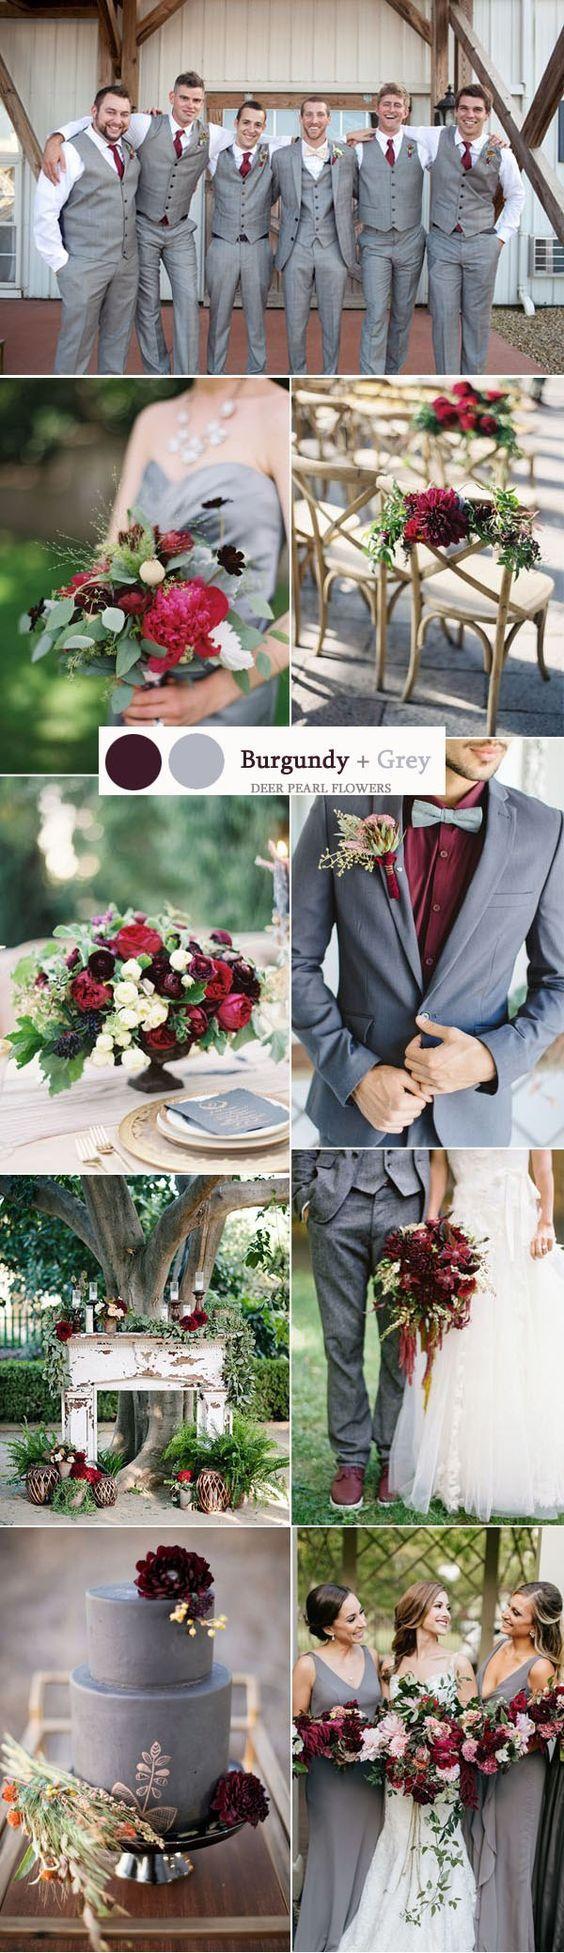 Wedding decorations royal blue october 2018 Kim Filippa kimialdenefilip on Pinterest